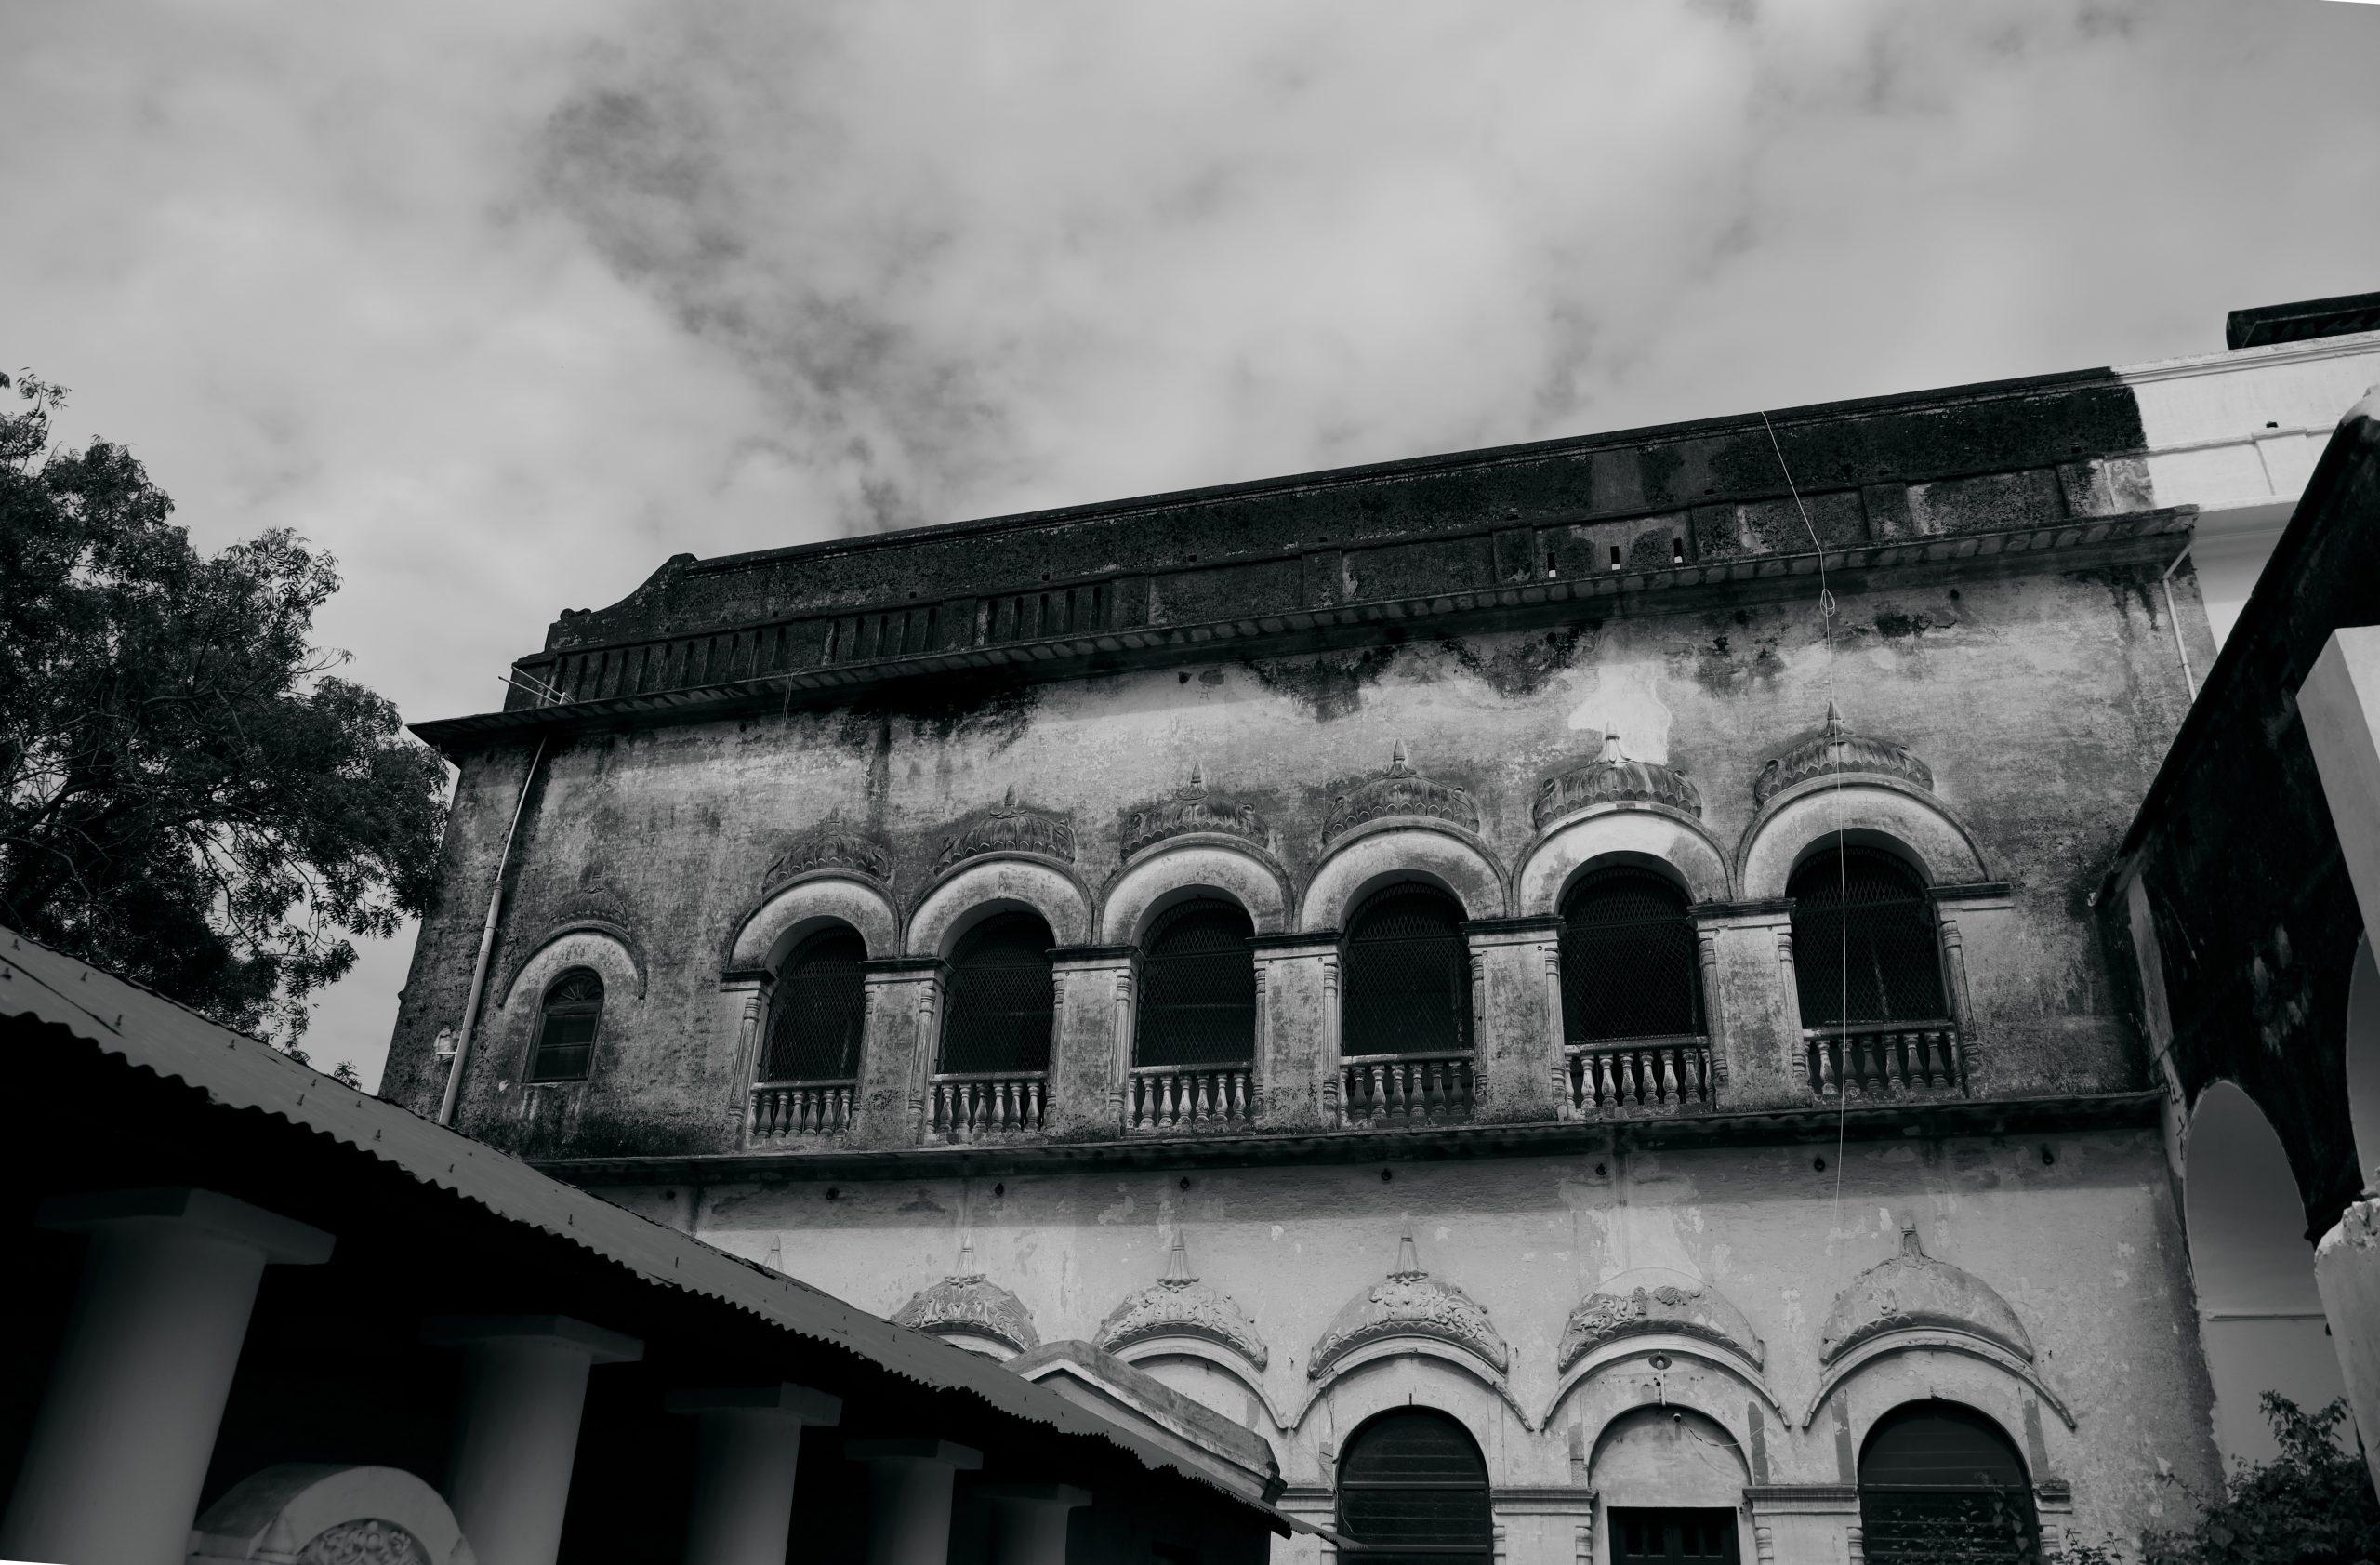 Monochromatic Old Building